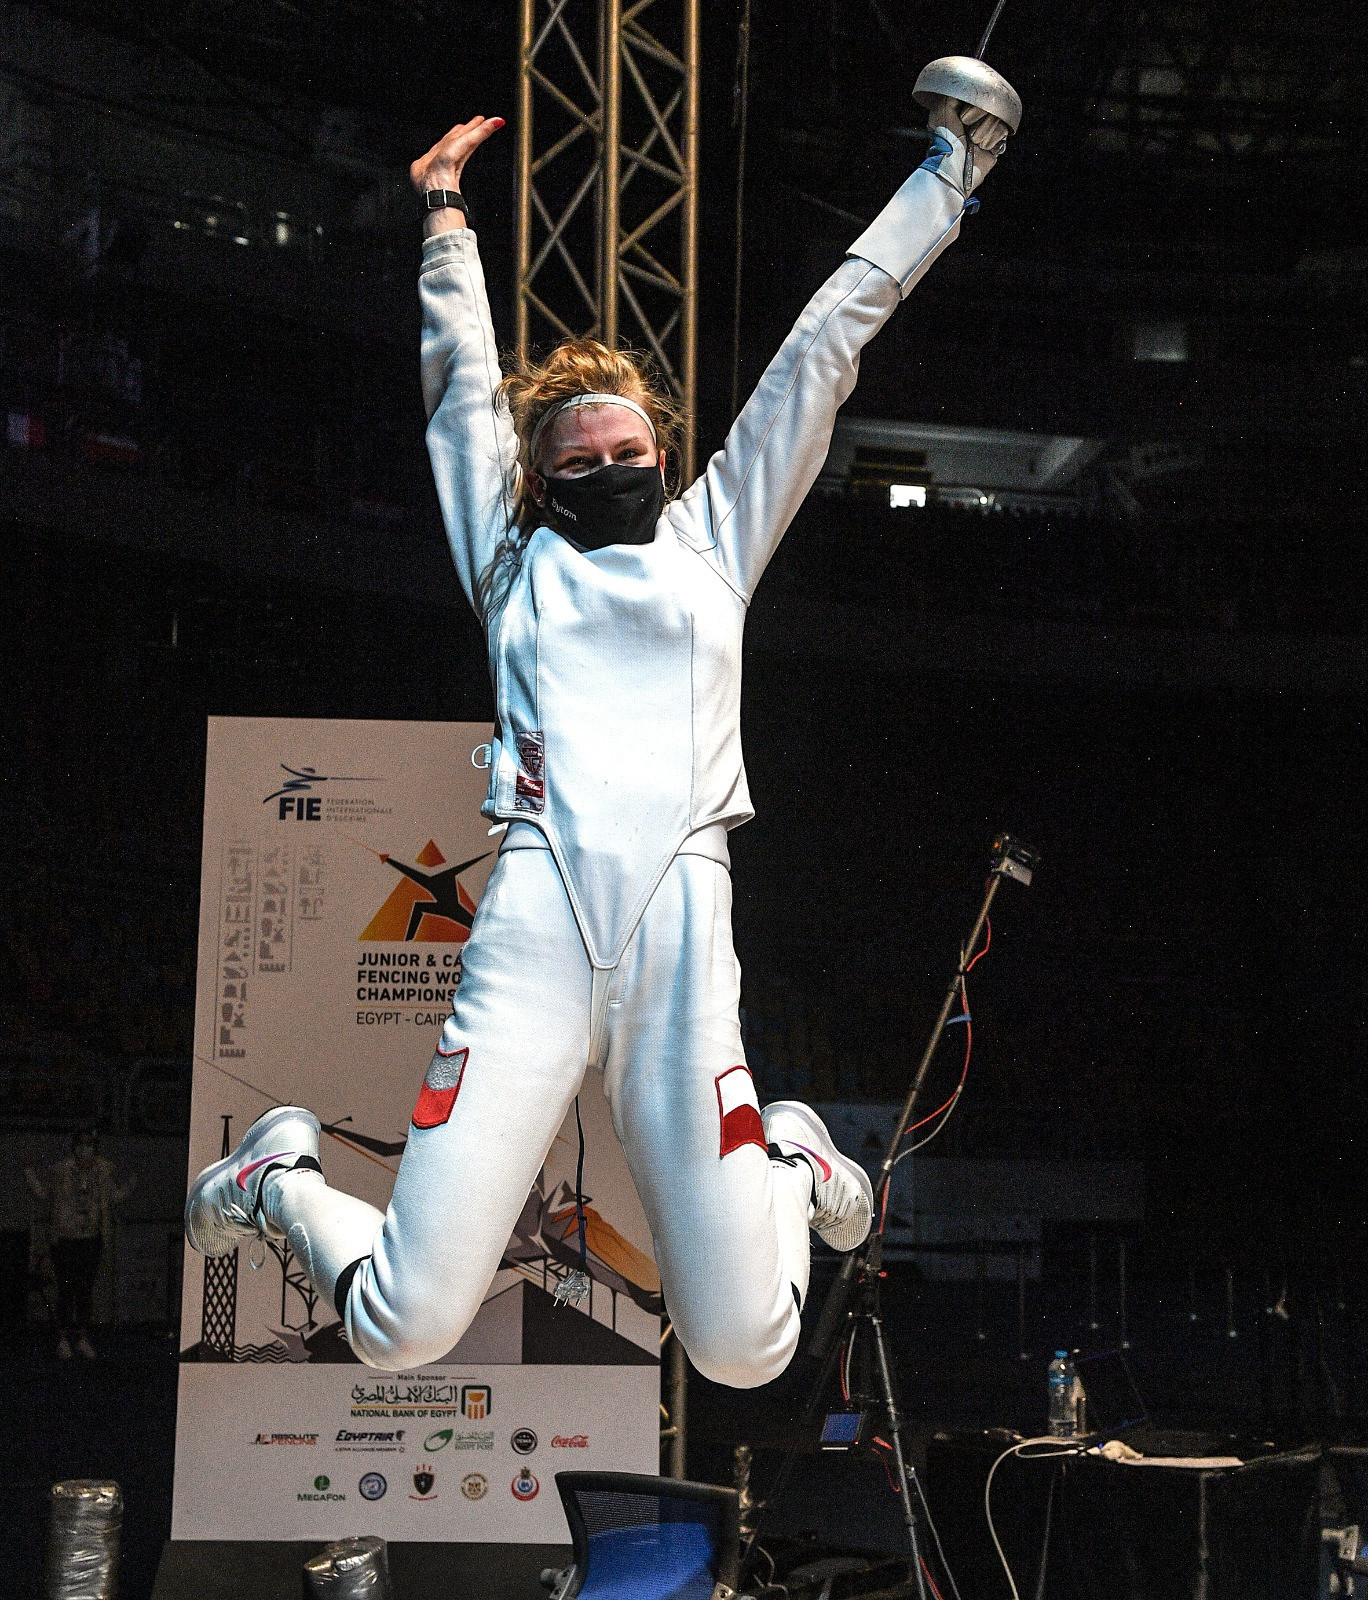 Poland win both épée titles at Cadet World Fencing Championships